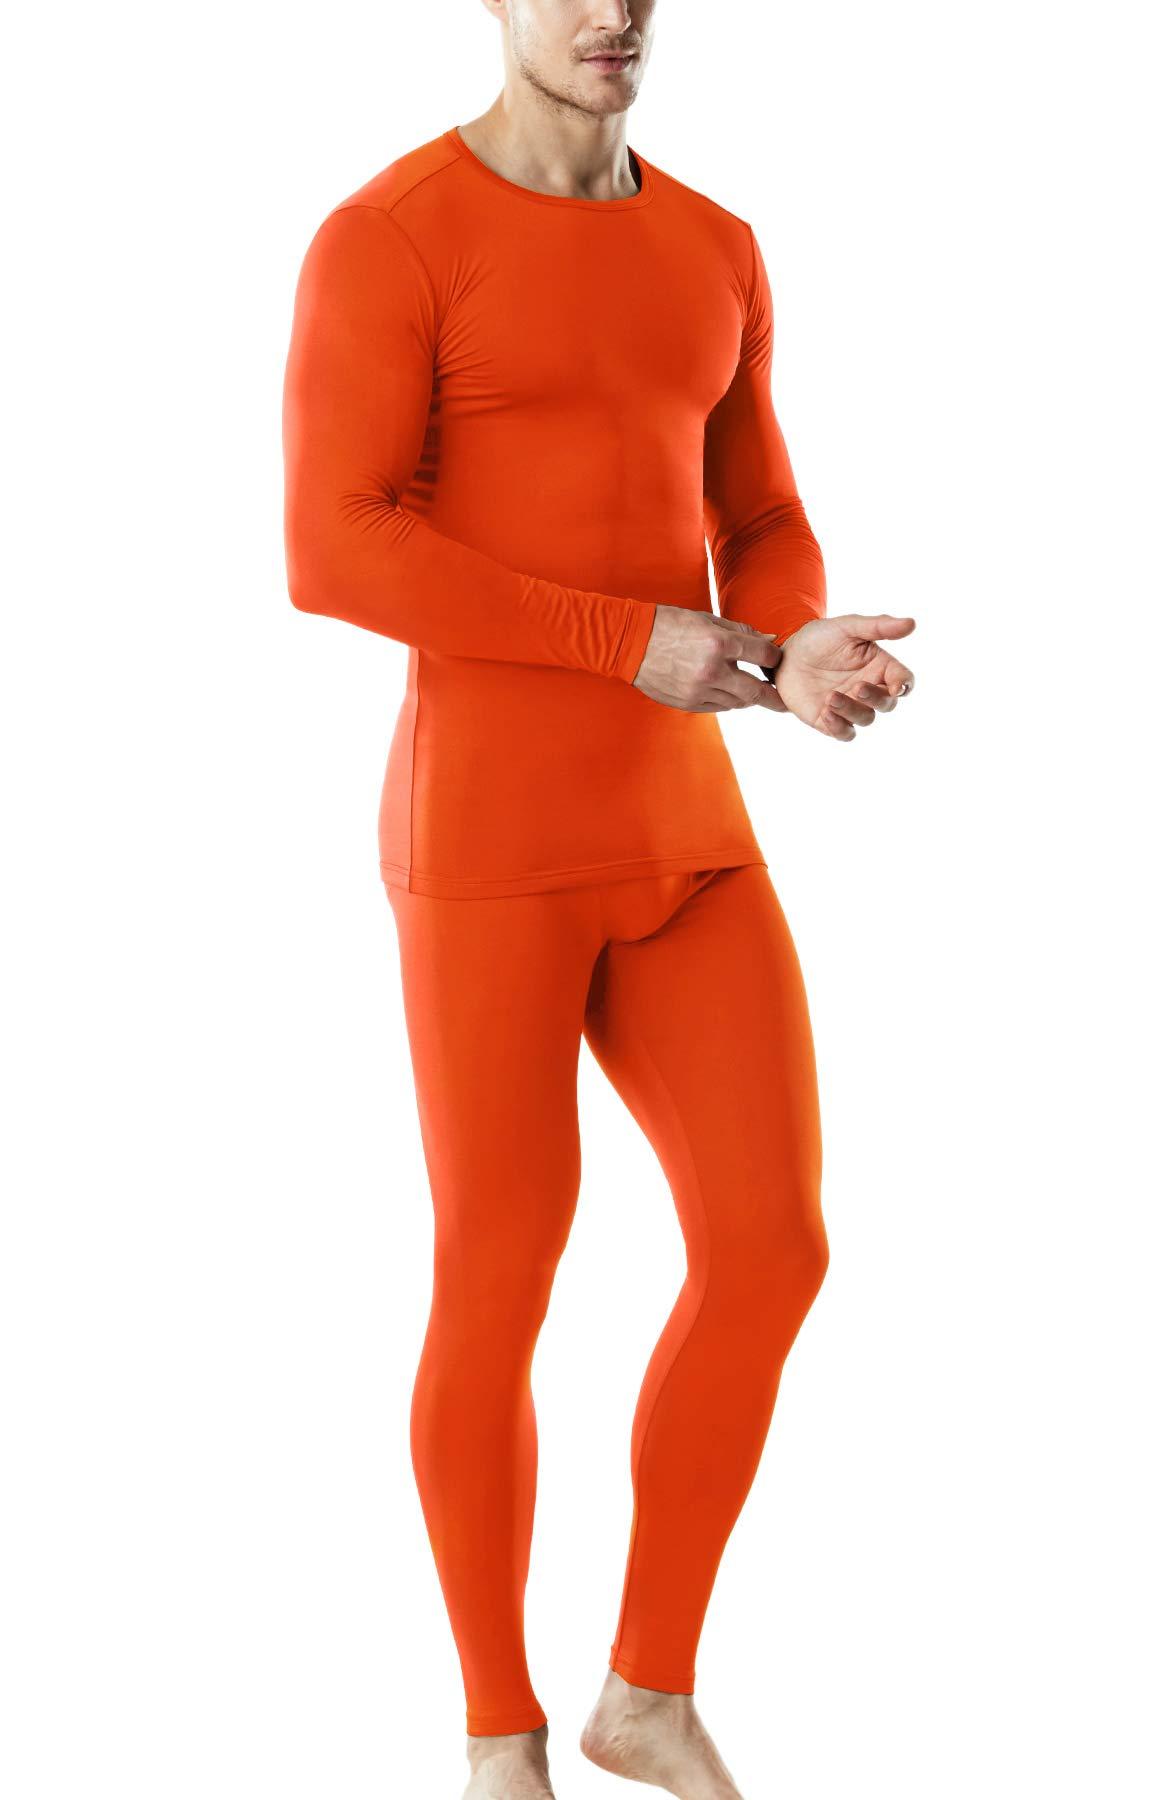 TSLA Blank Men's Microfiber Fleece Lined Top & Bottom Set, Thermal Fleece(mhs100) - Orange, Medium by TSLA